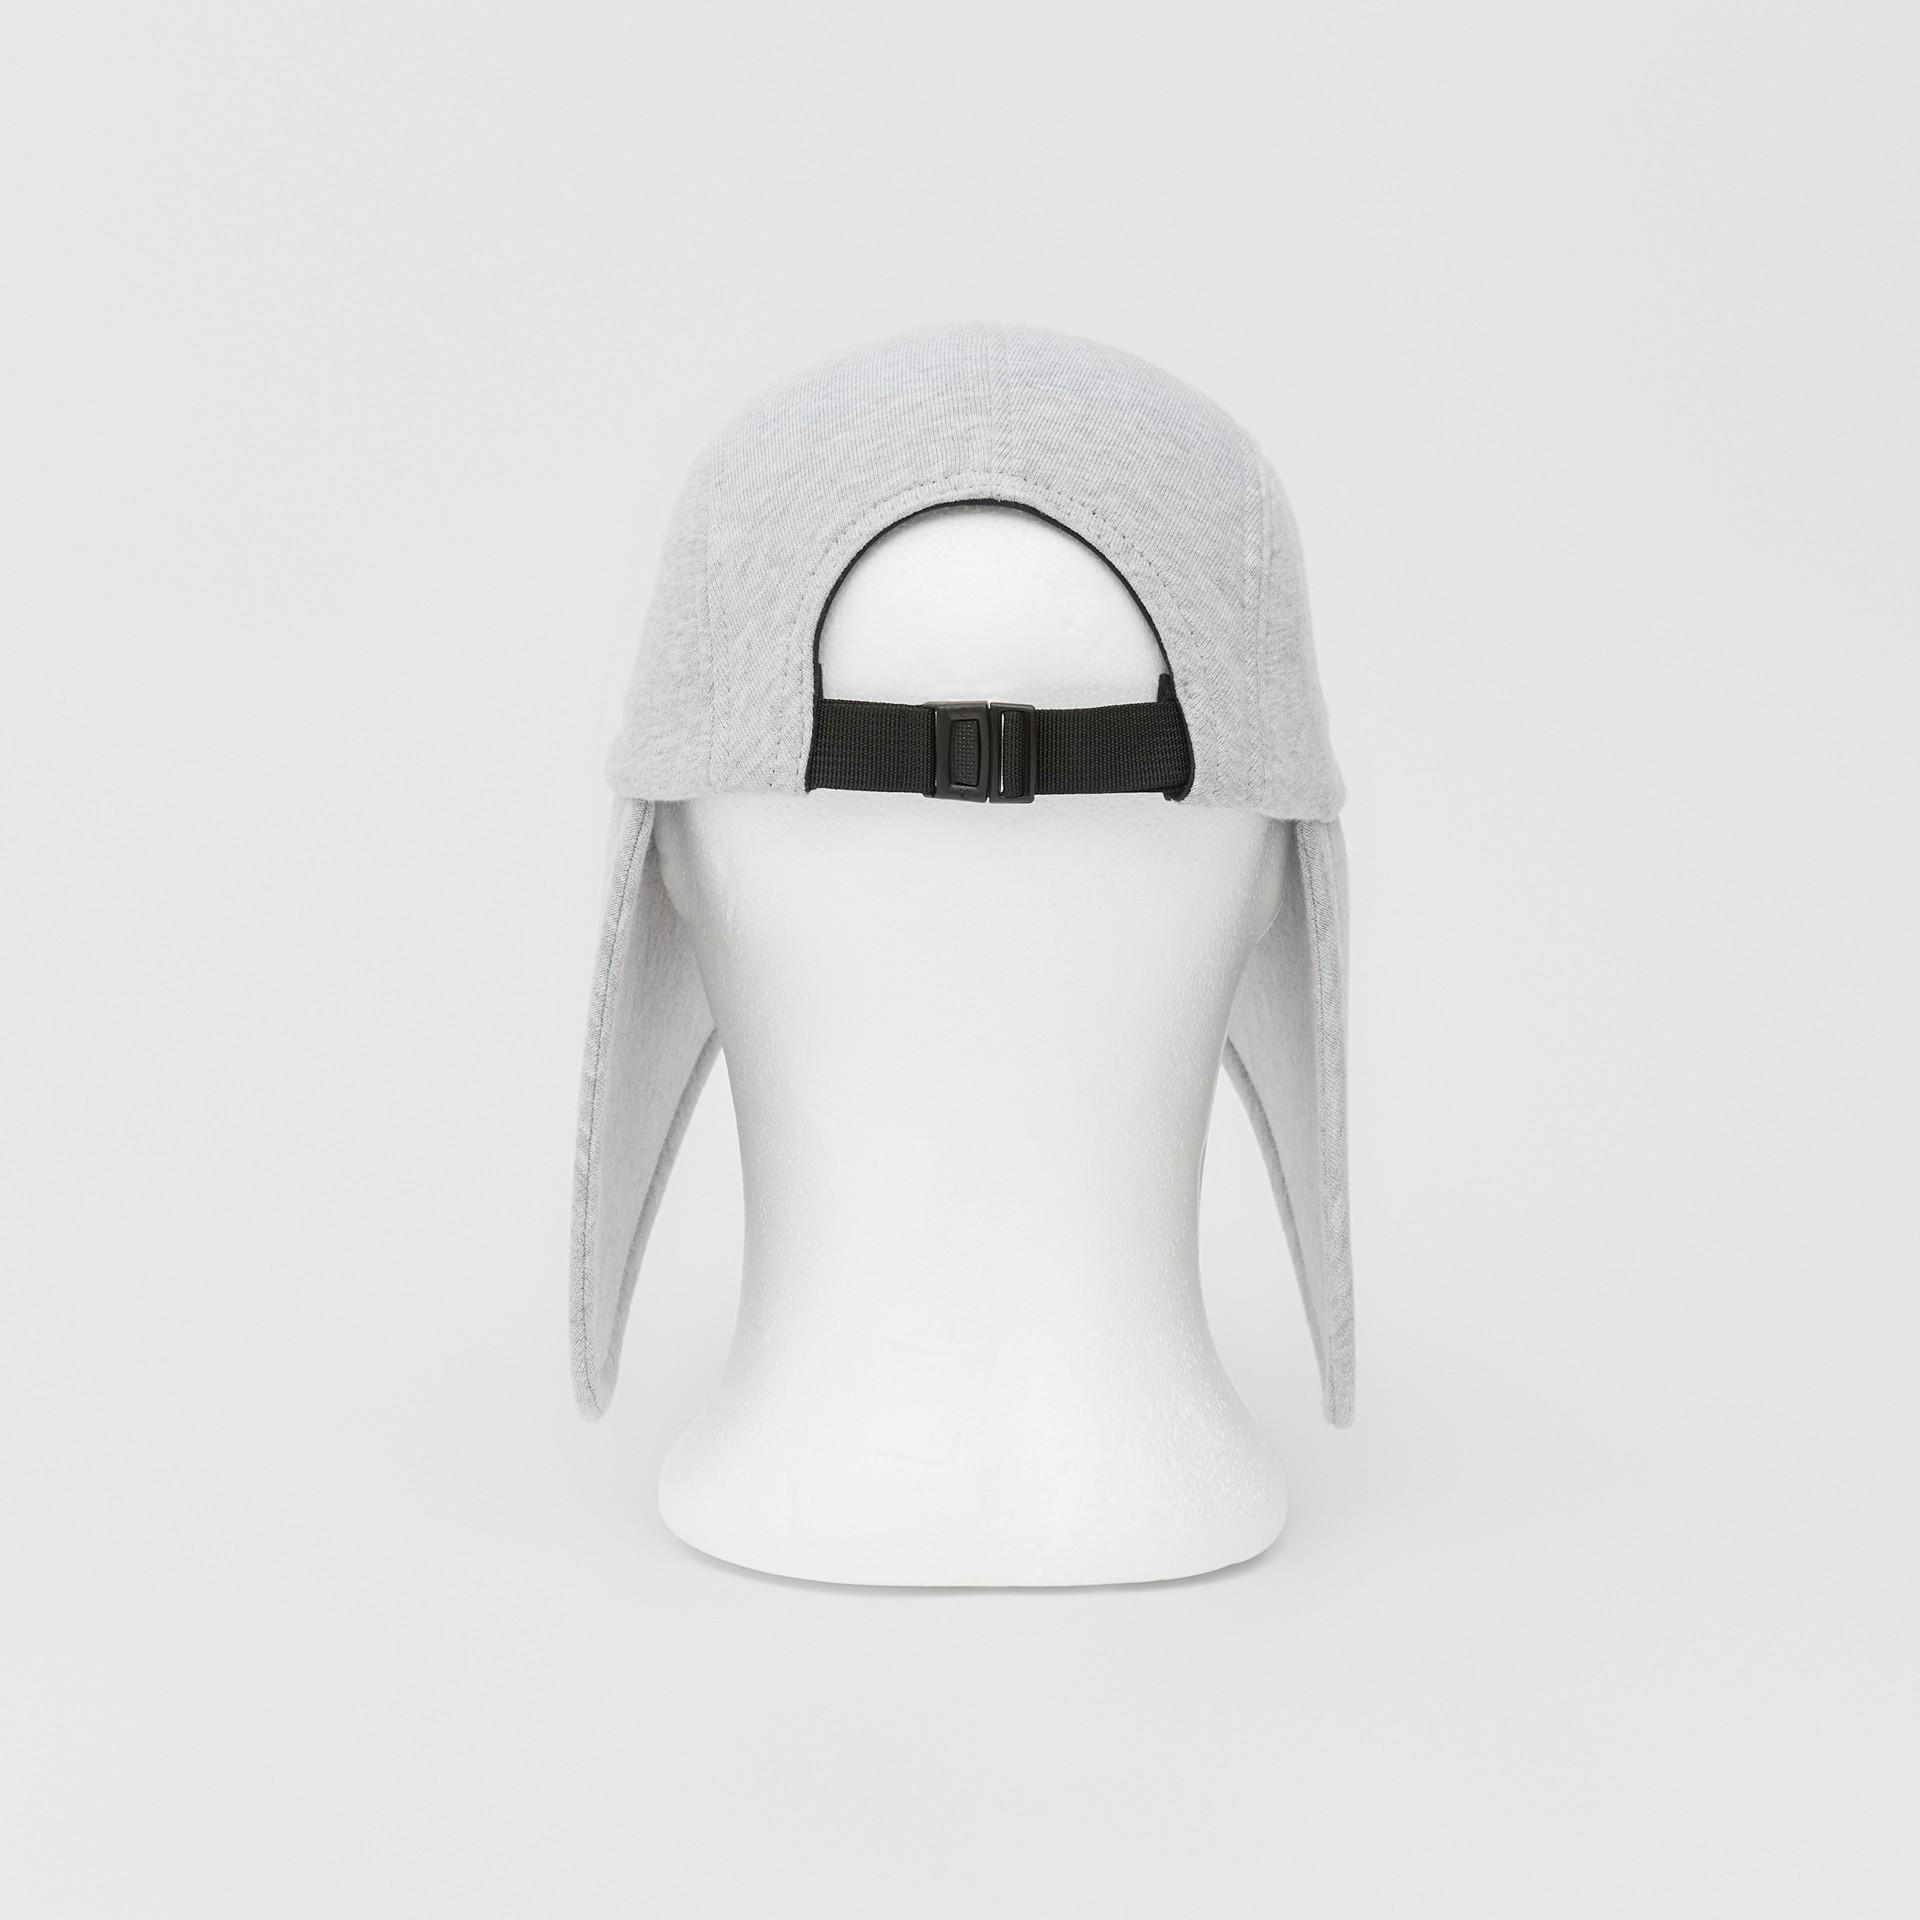 Logo Appliqué Cotton Jersey Bonnet Cap in Light Pebble Grey | Burberry - gallery image 6